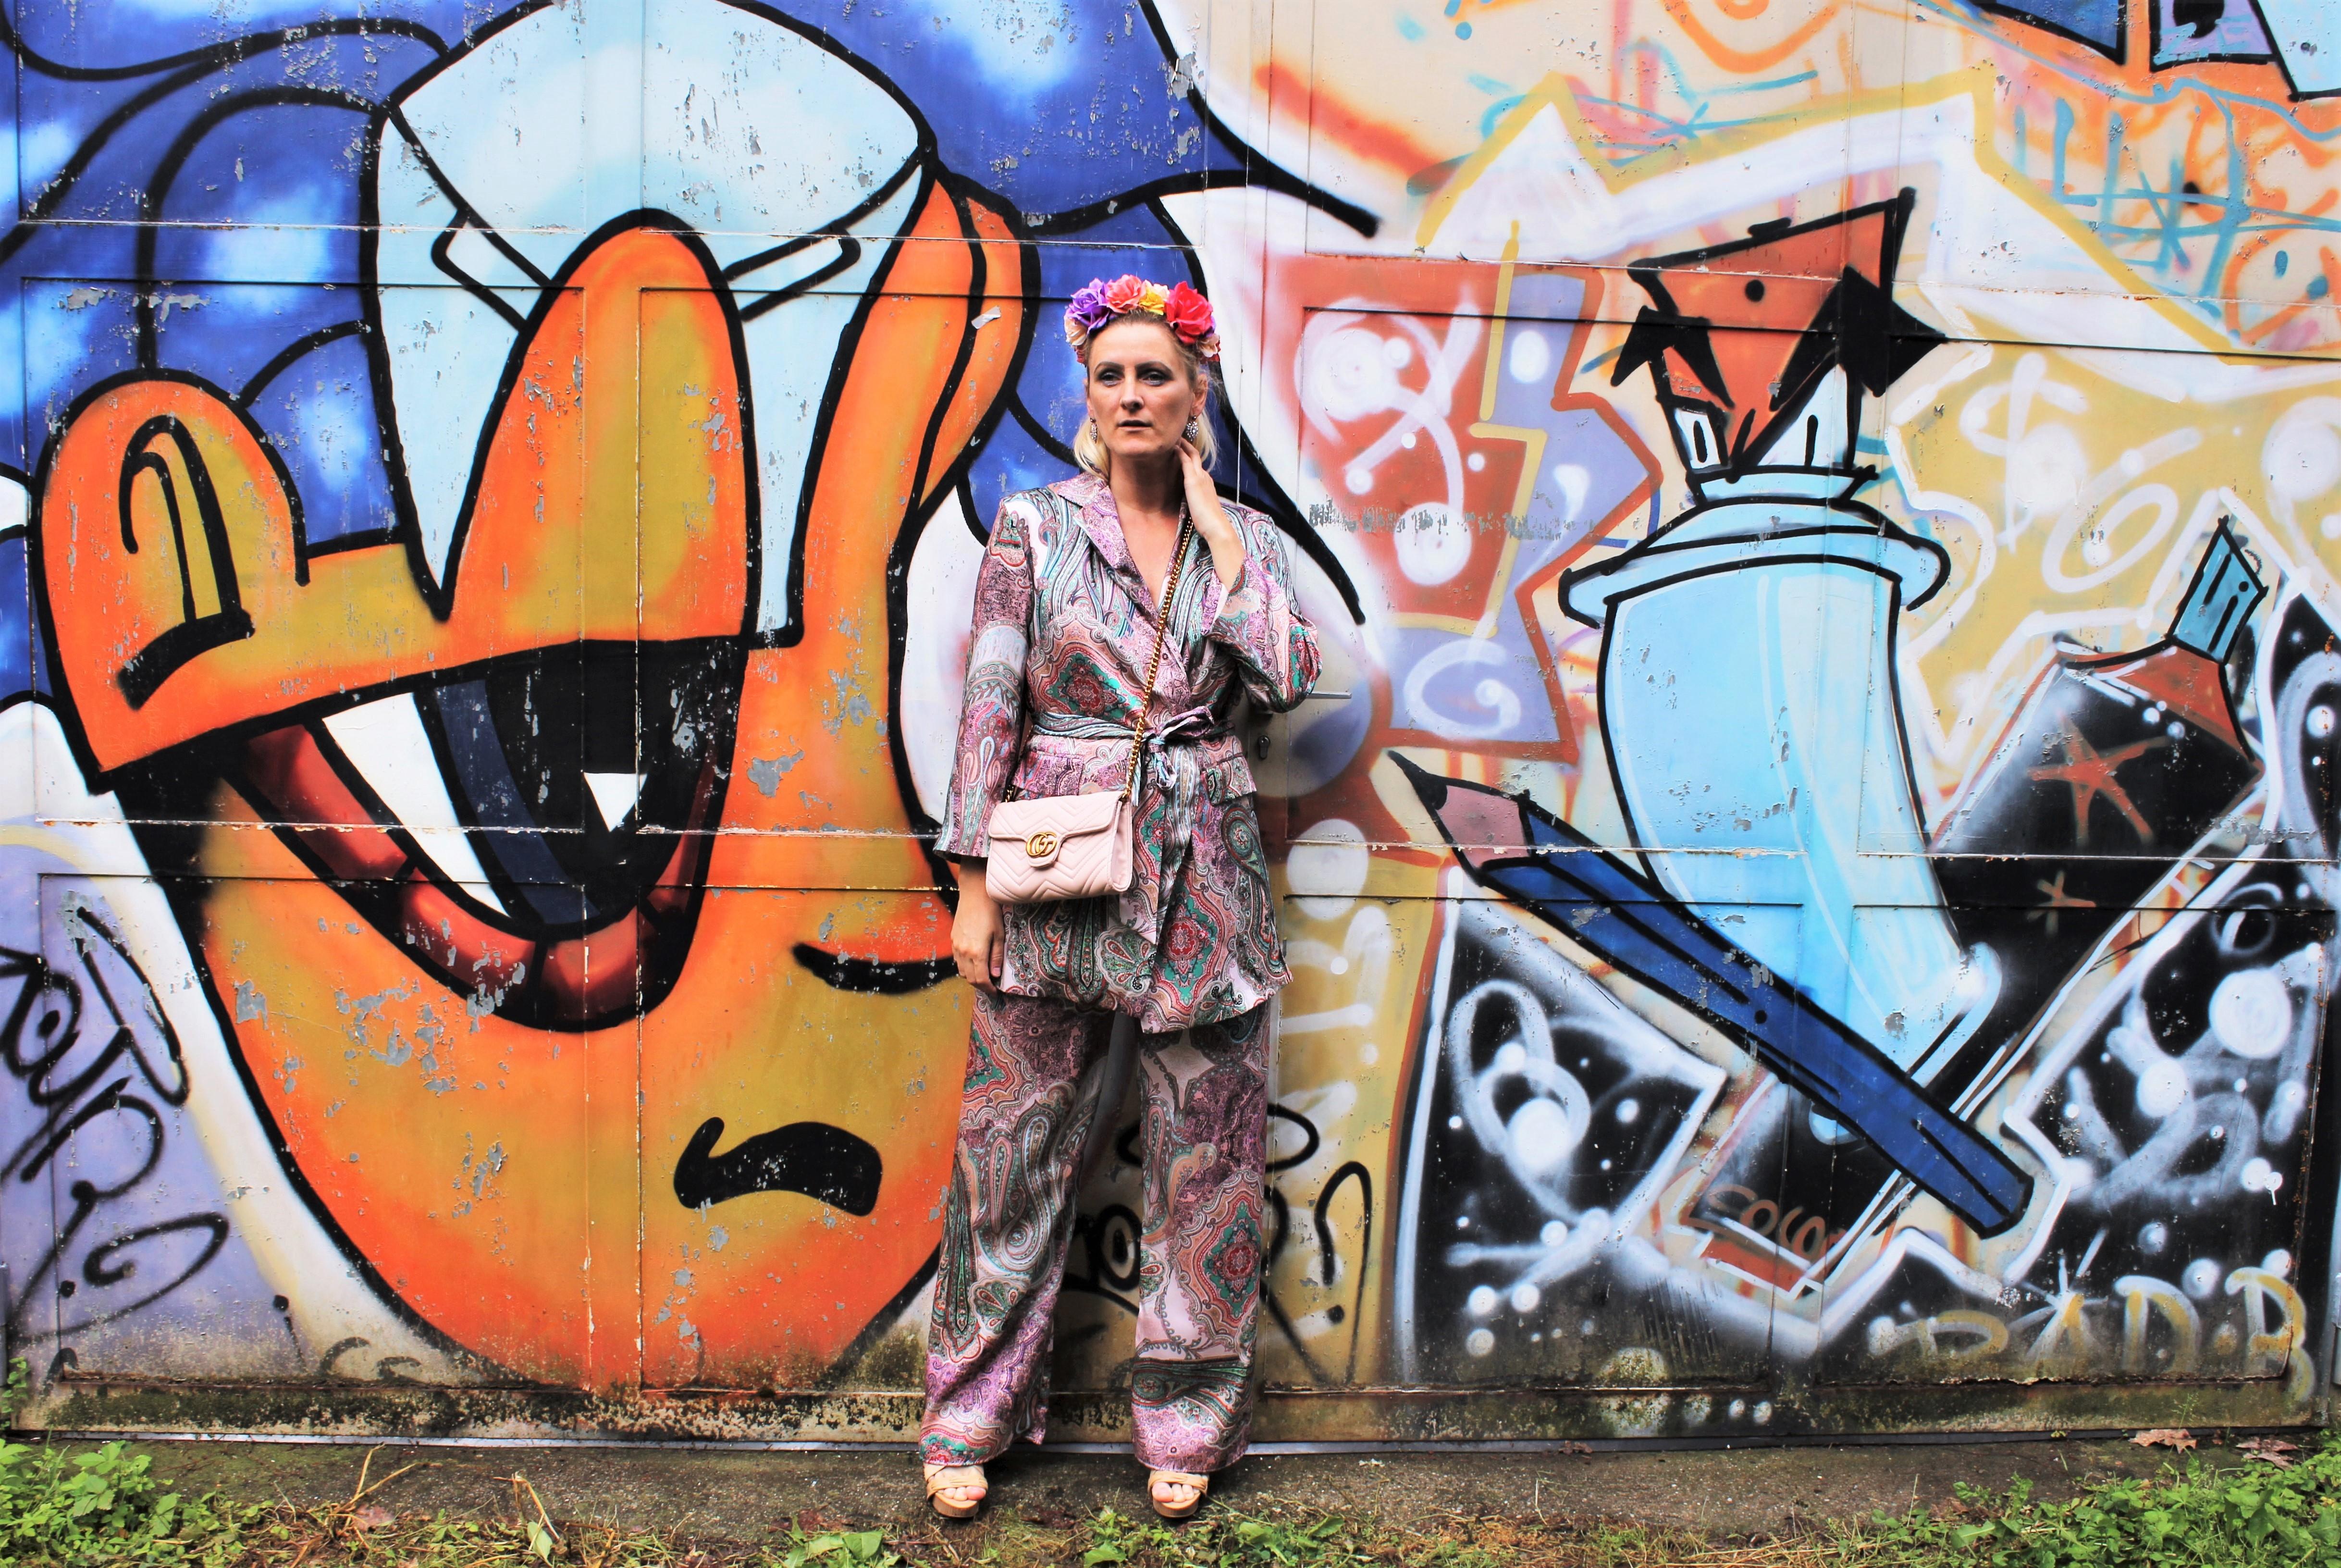 Paisley-Print-Hosenanzüge-Pastellfarben-Allover-Look-carrieslifestyle-Tamara-Prutsch